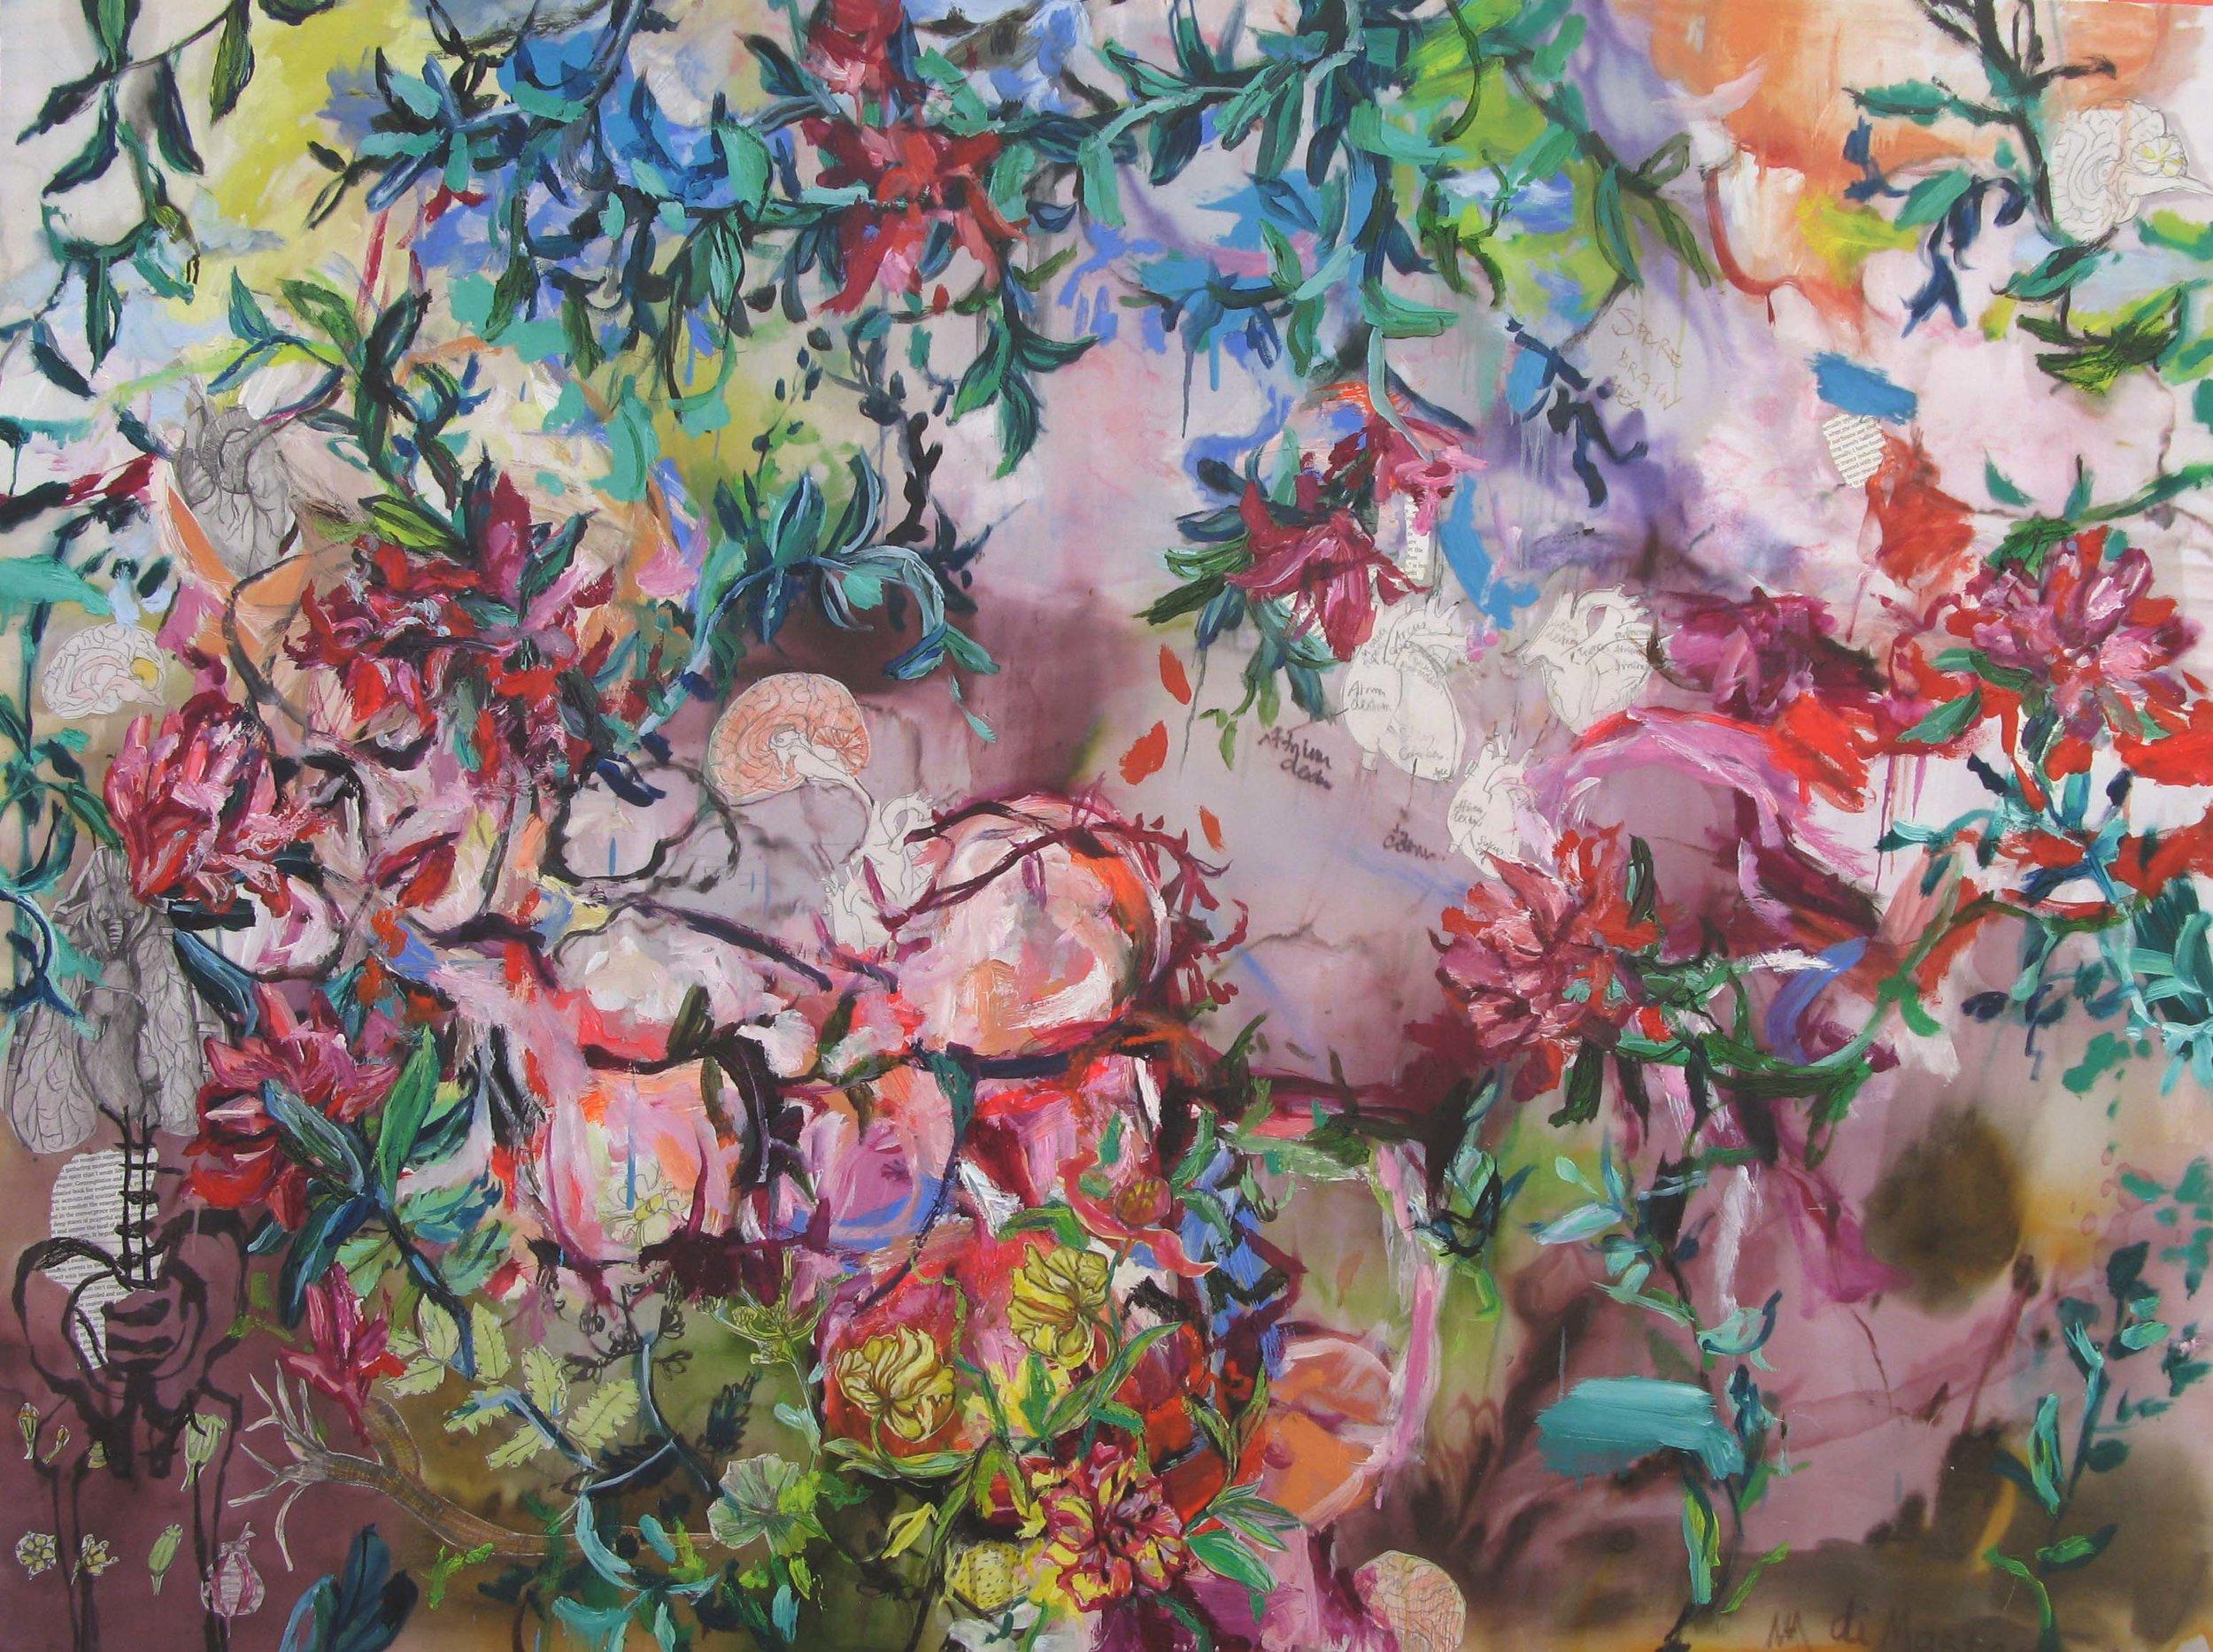 Life tapestries No4, 120x100cm, mixed media on silk, 2018.jpg